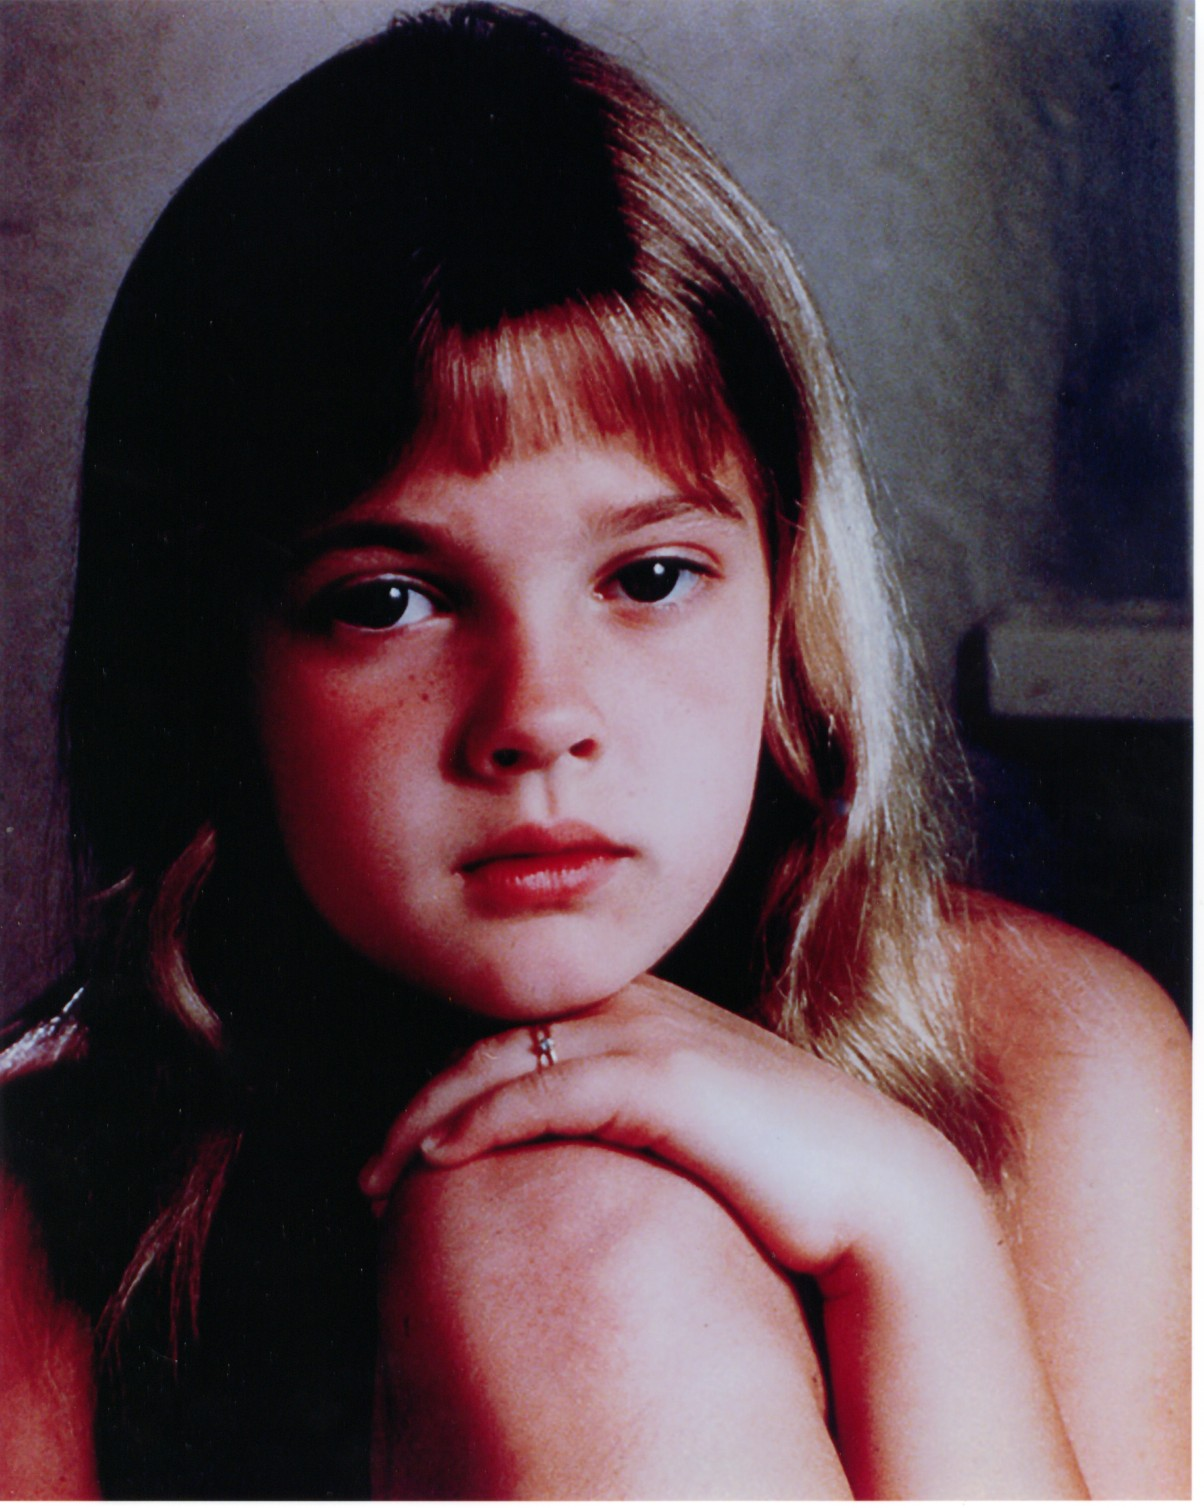 http://1.bp.blogspot.com/-5K90oPoJ27w/Tow2-akR5nI/AAAAAAAAEiQ/8P-9ONzjV-o/s1600/Drew+Barrymore+YOUNG+04.jpg